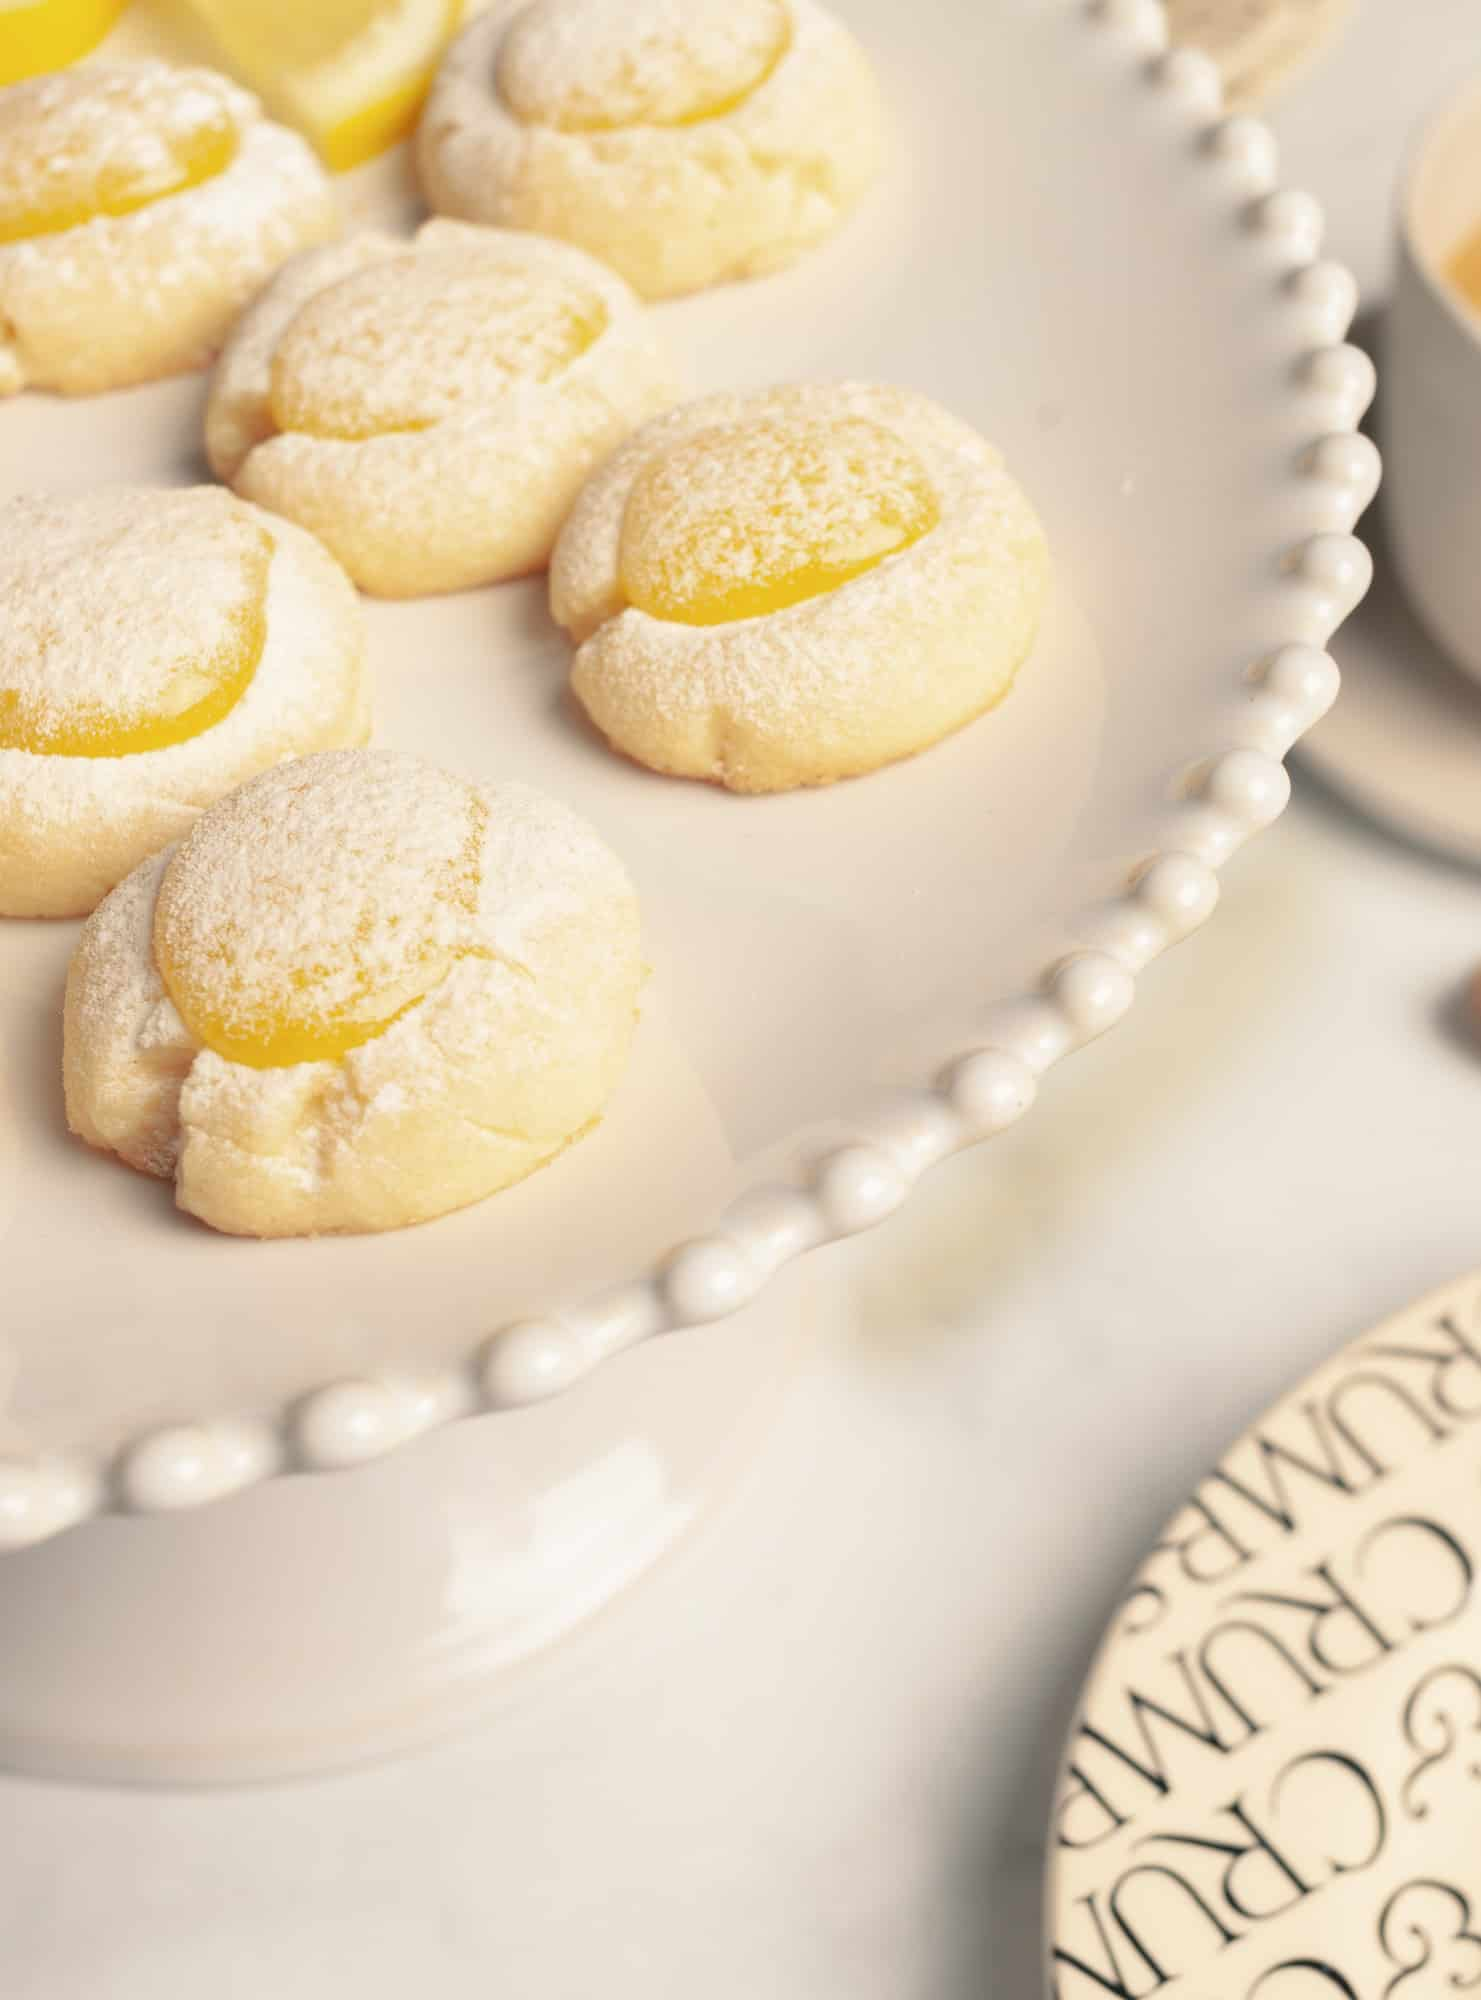 closeup of lemon thumbprint cookies on a white pedestal plate